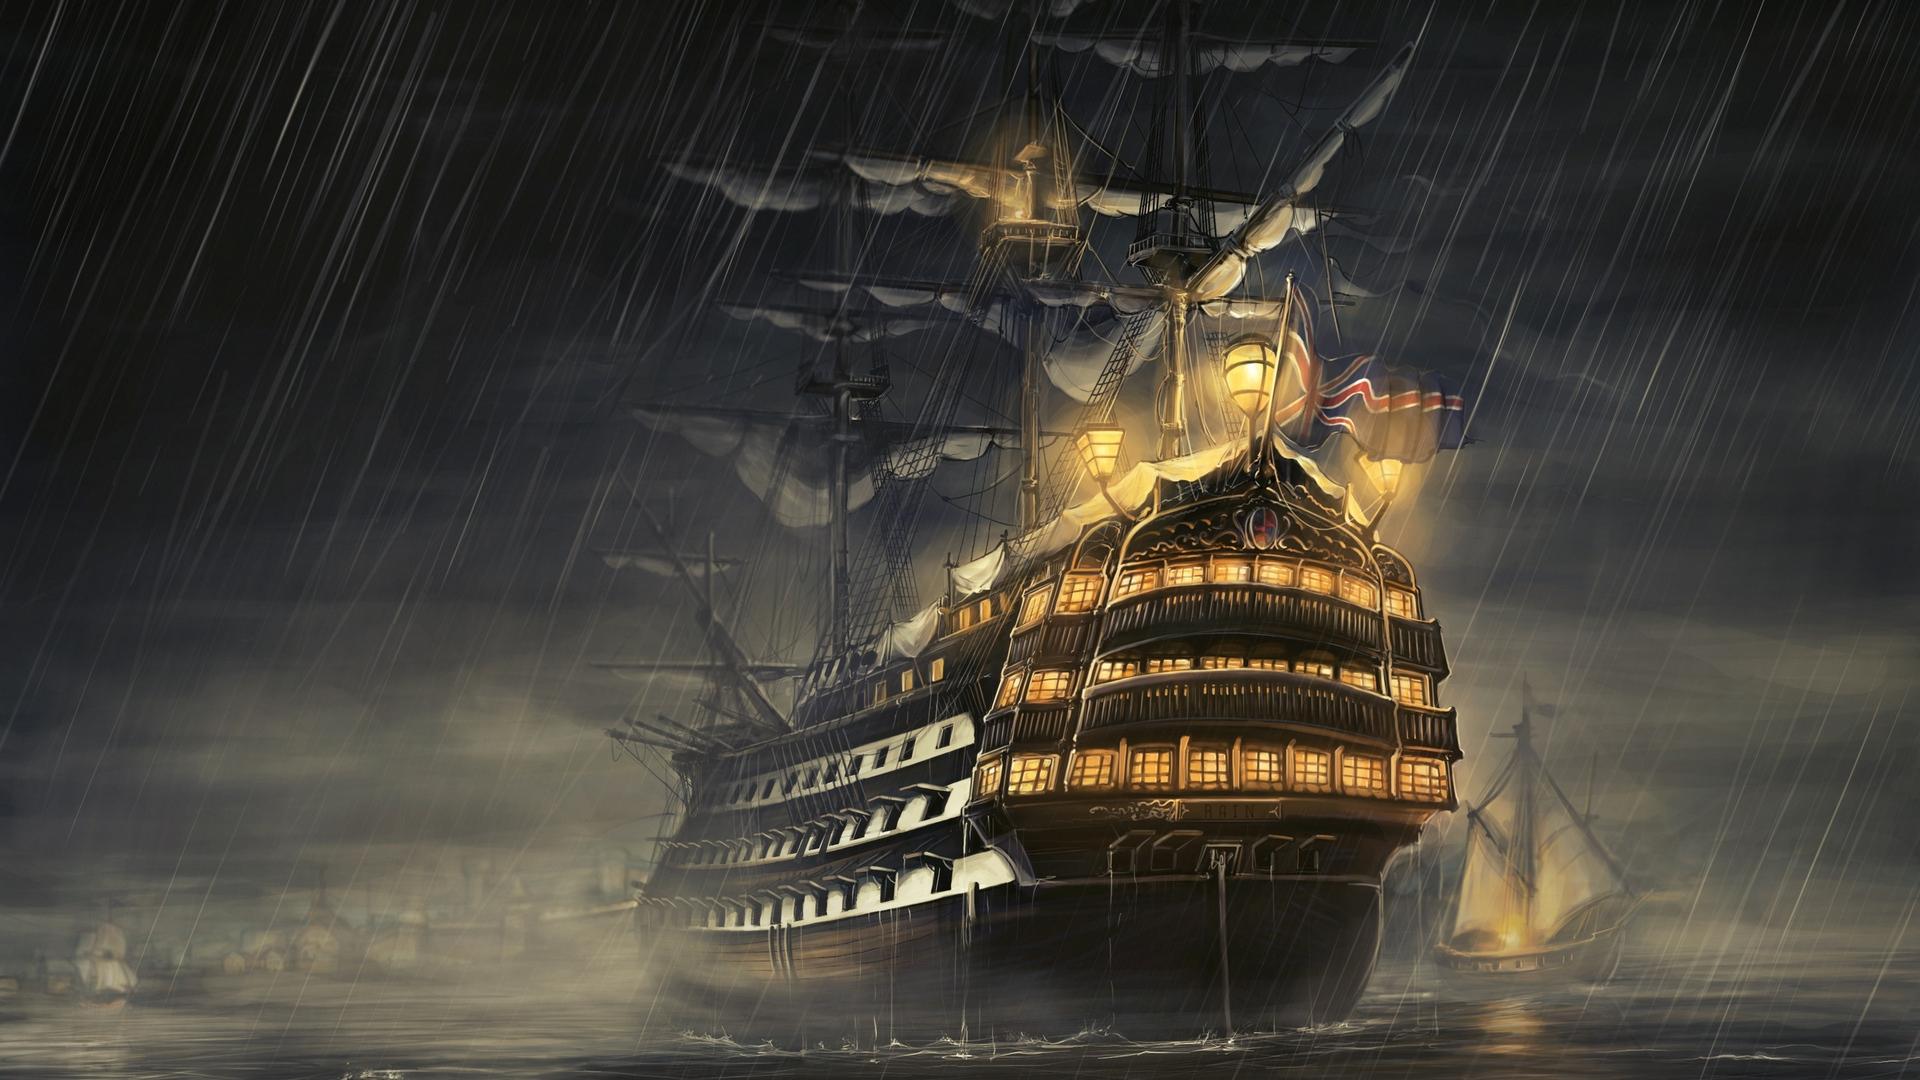 Download wallpaper 1920x1080 ships sea light rain full hd hdtv 1920x1080